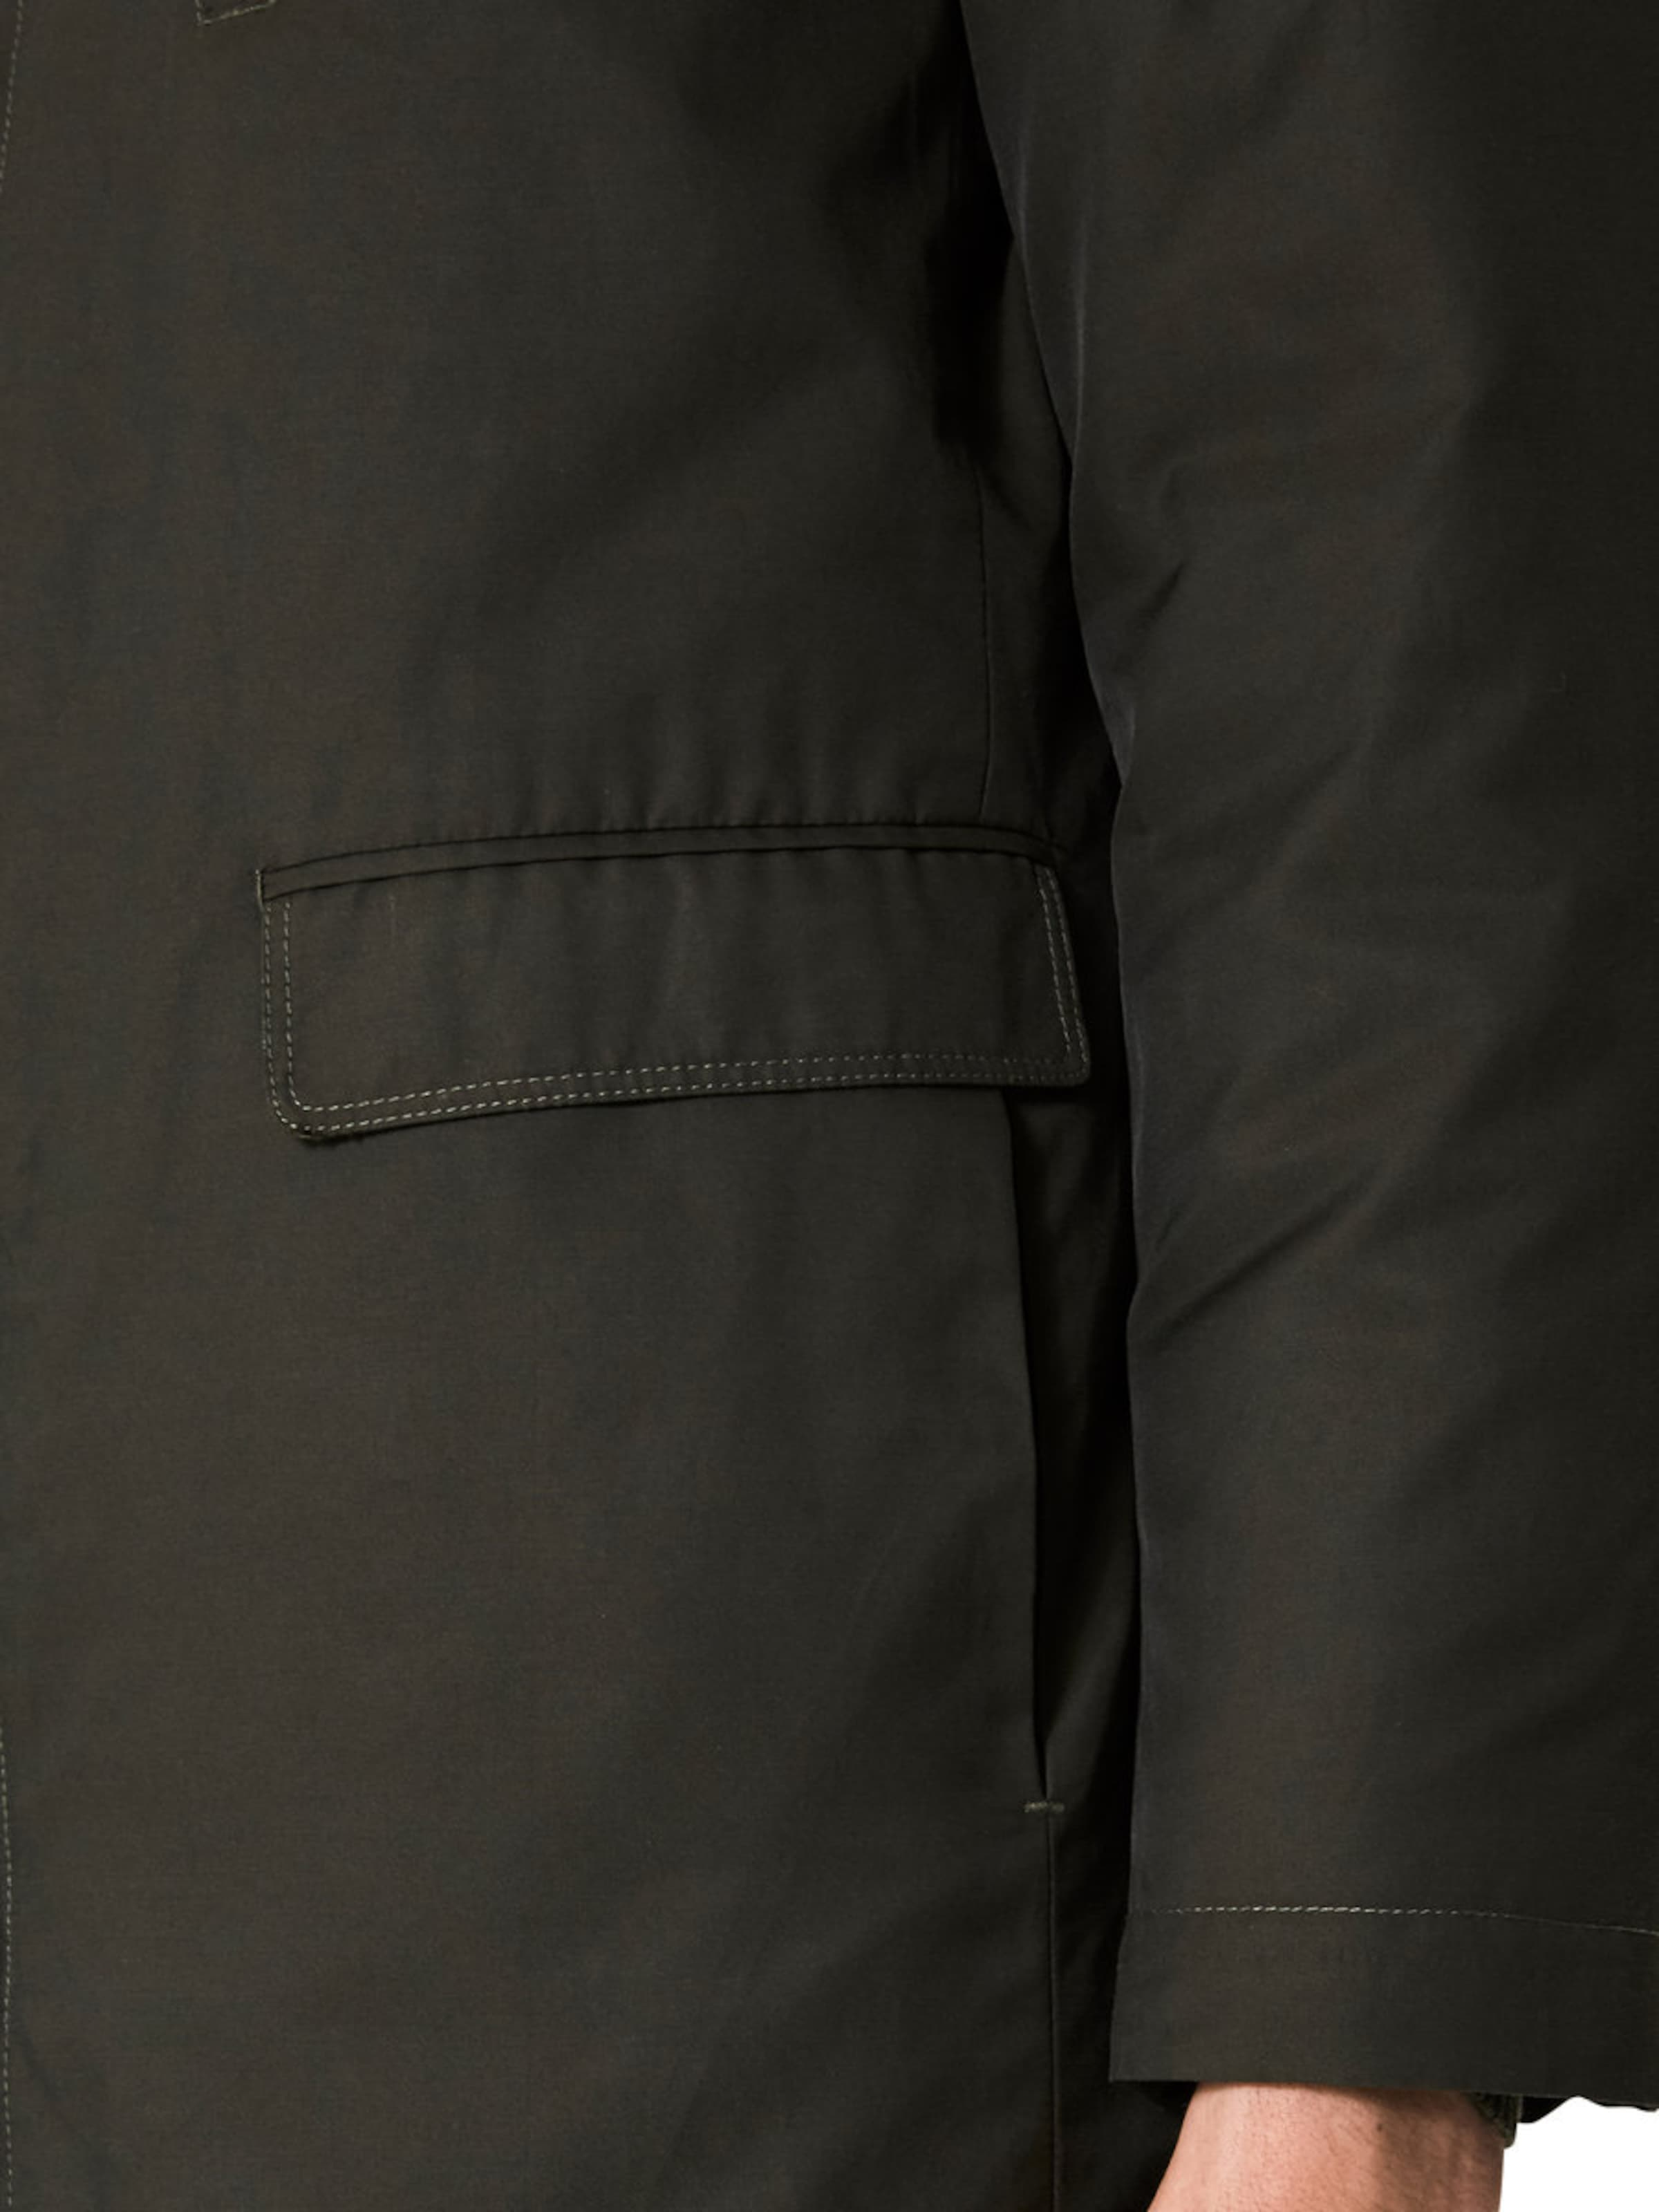 Spielraum Footaction SELECTED HOMME Jacke Verkauf Exklusiv N2smMD